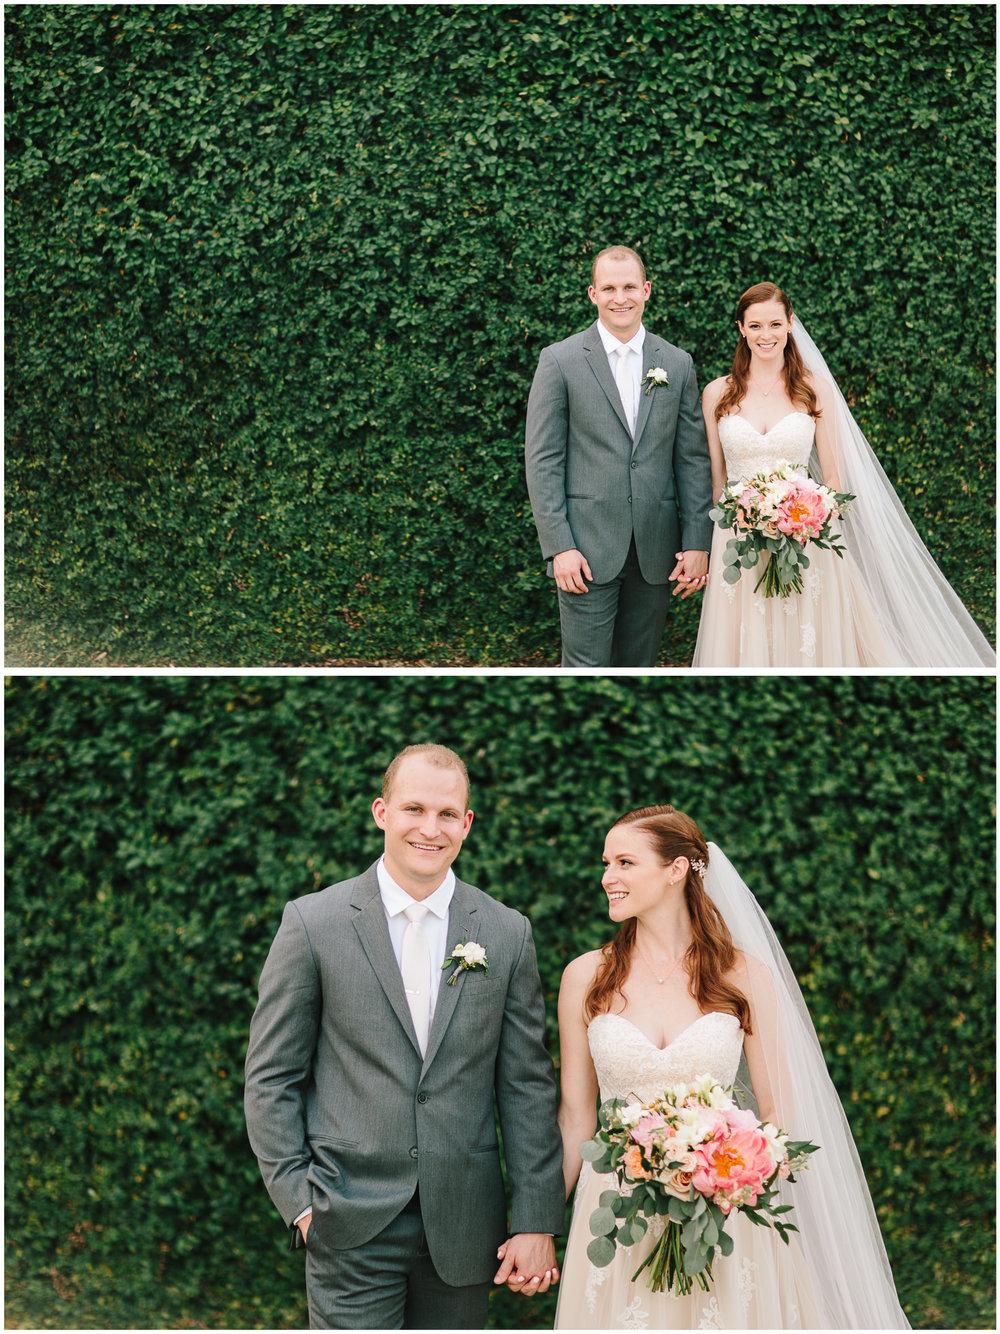 bella_collina_wedding_60.jpg